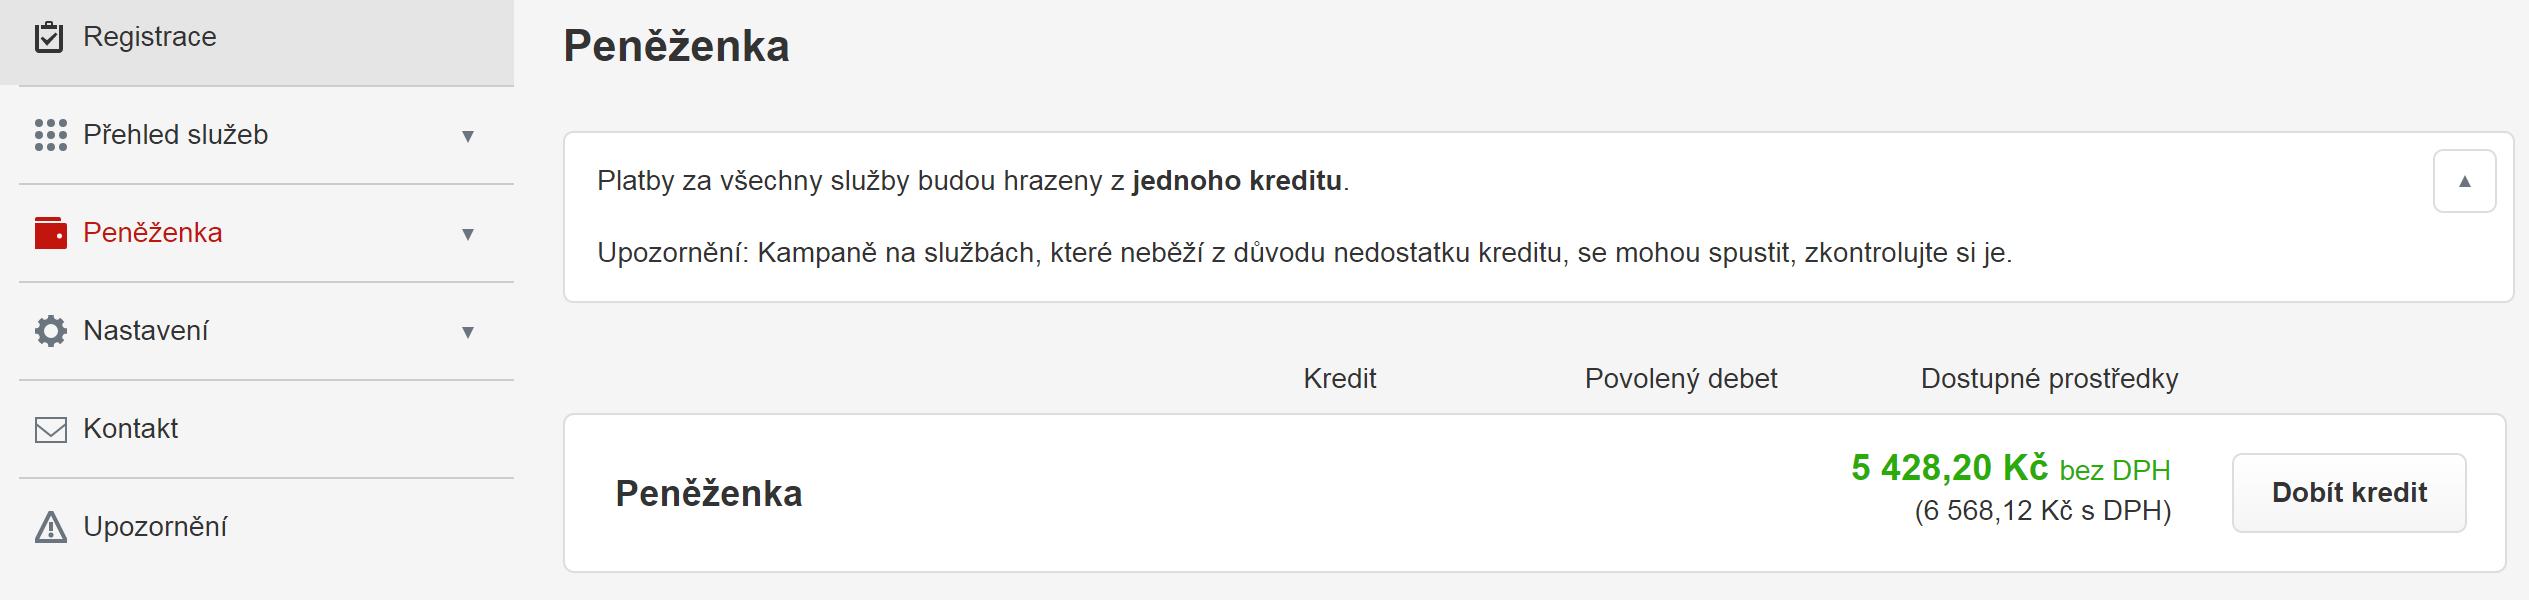 https://napoveda.seznam.cz/soubory/Zbozi.cz/img/kampan_6.png